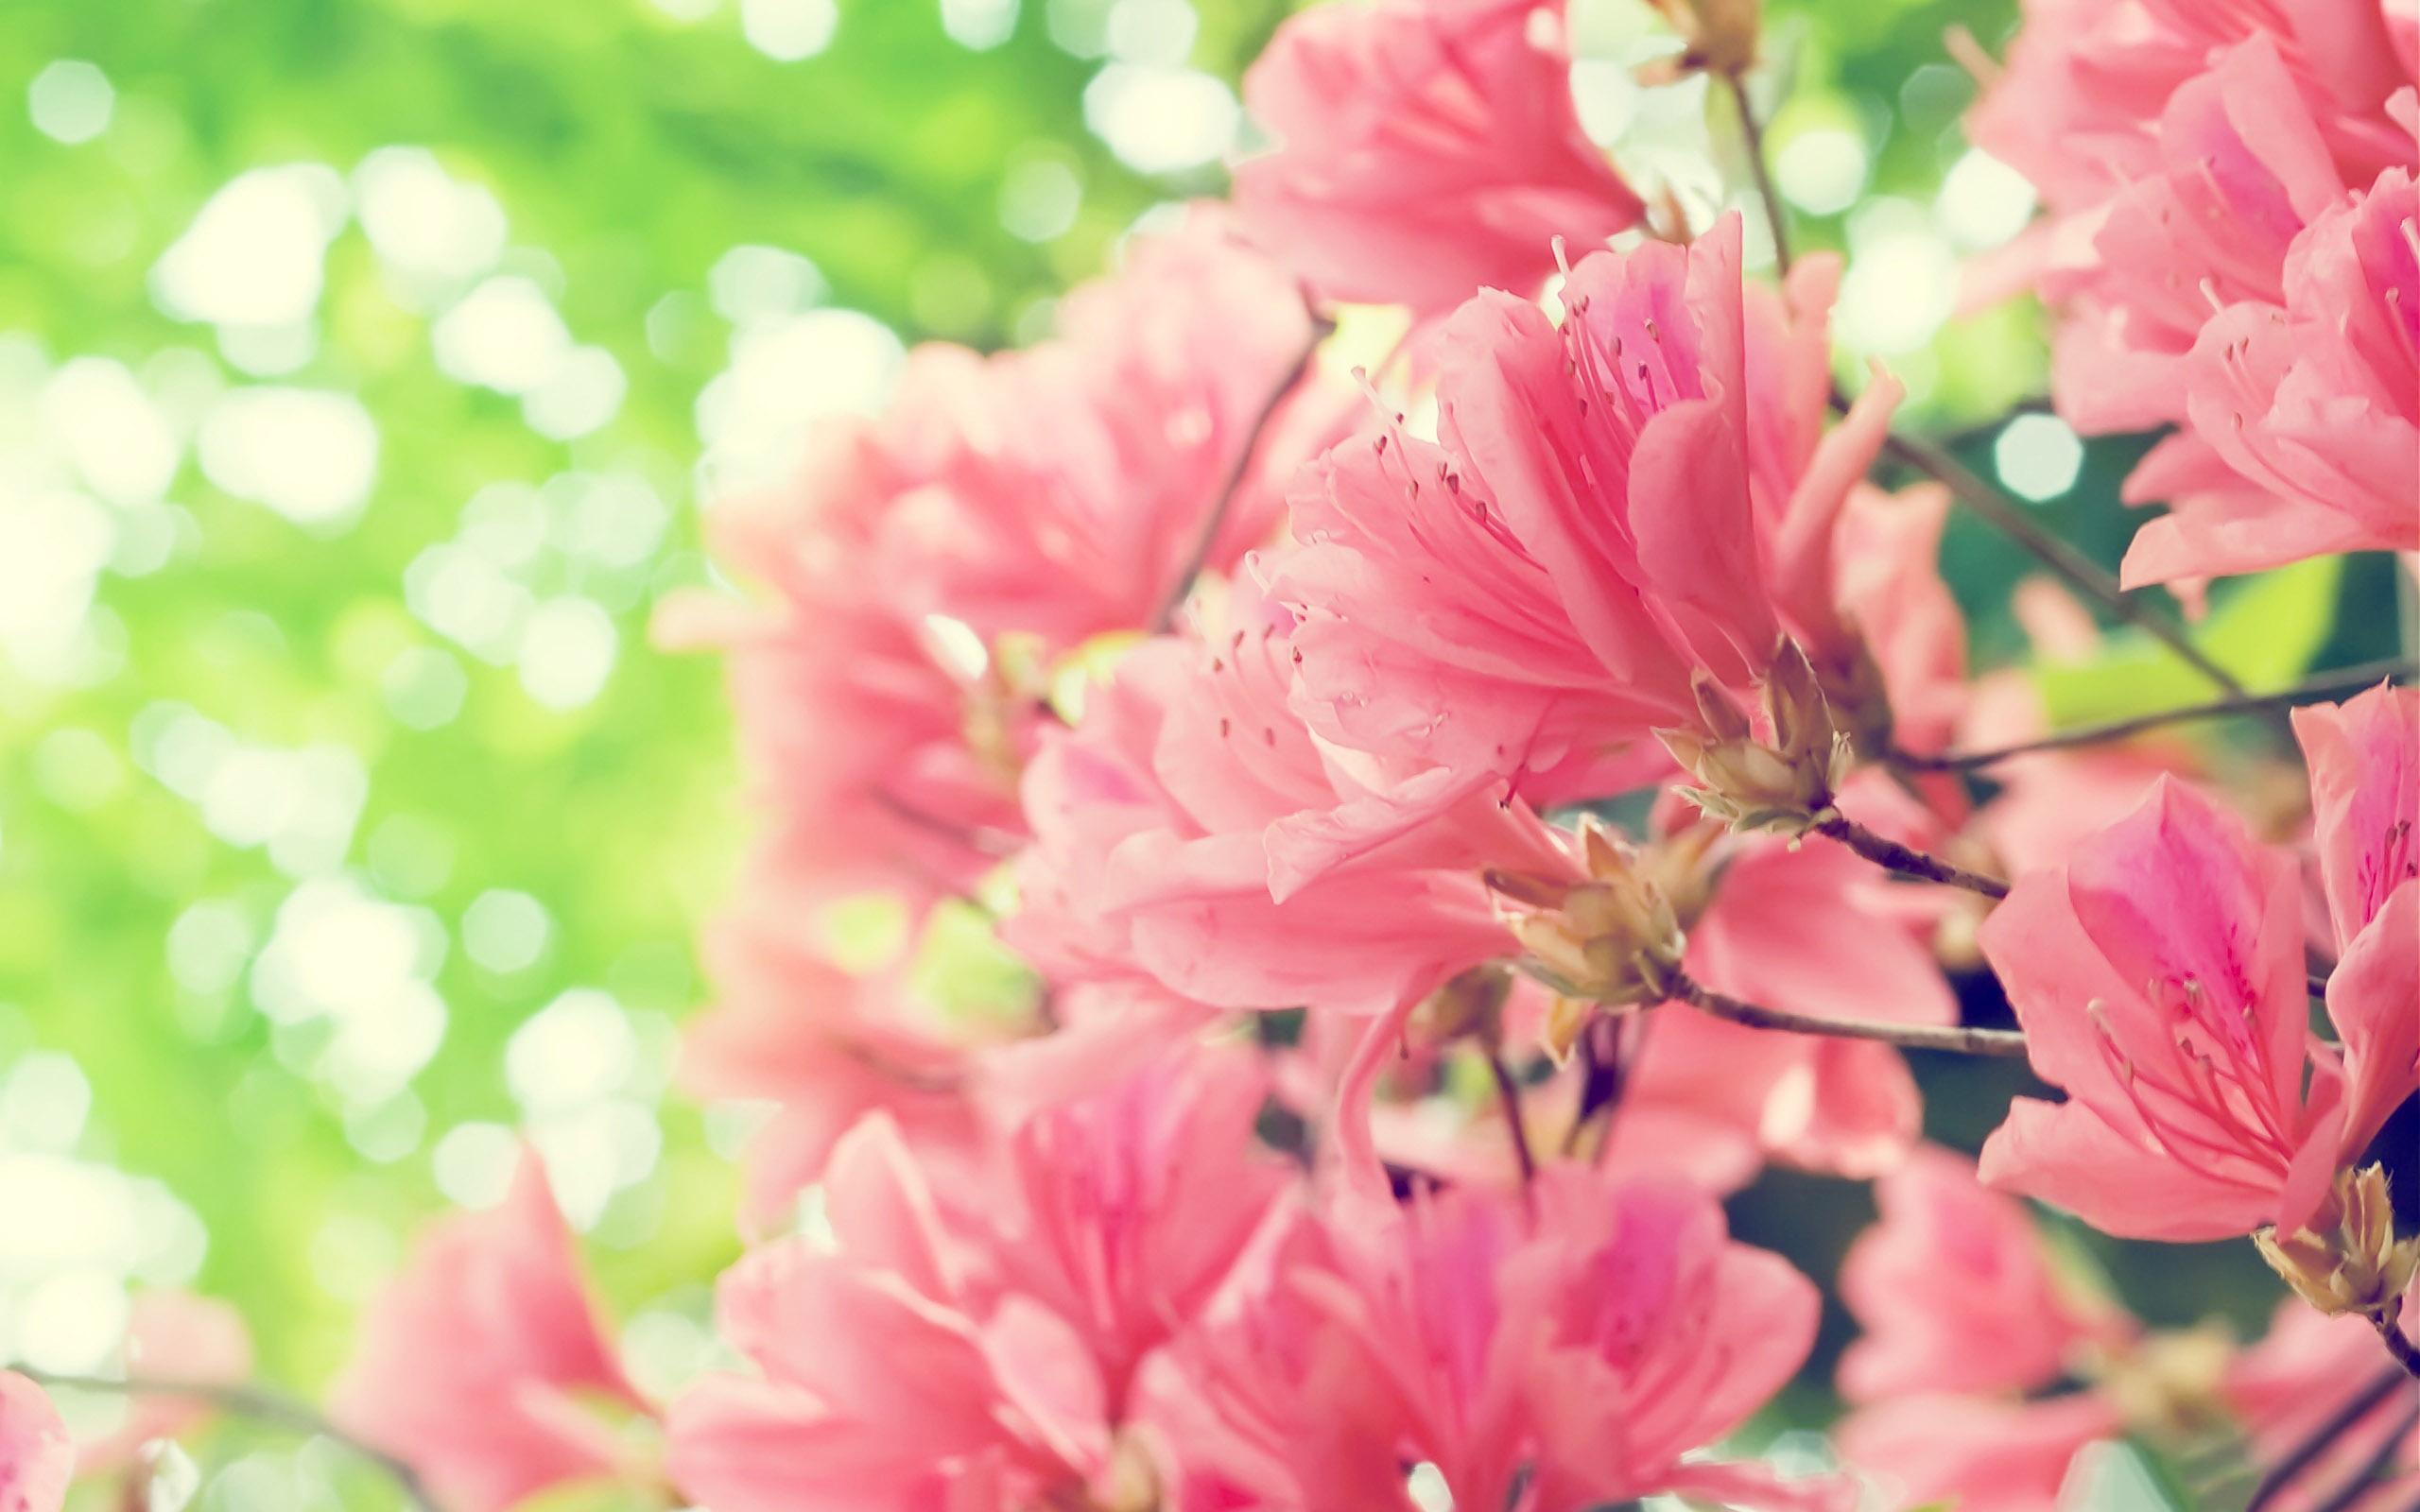 Beautiful pink spring flowers - HD nature wallpaper